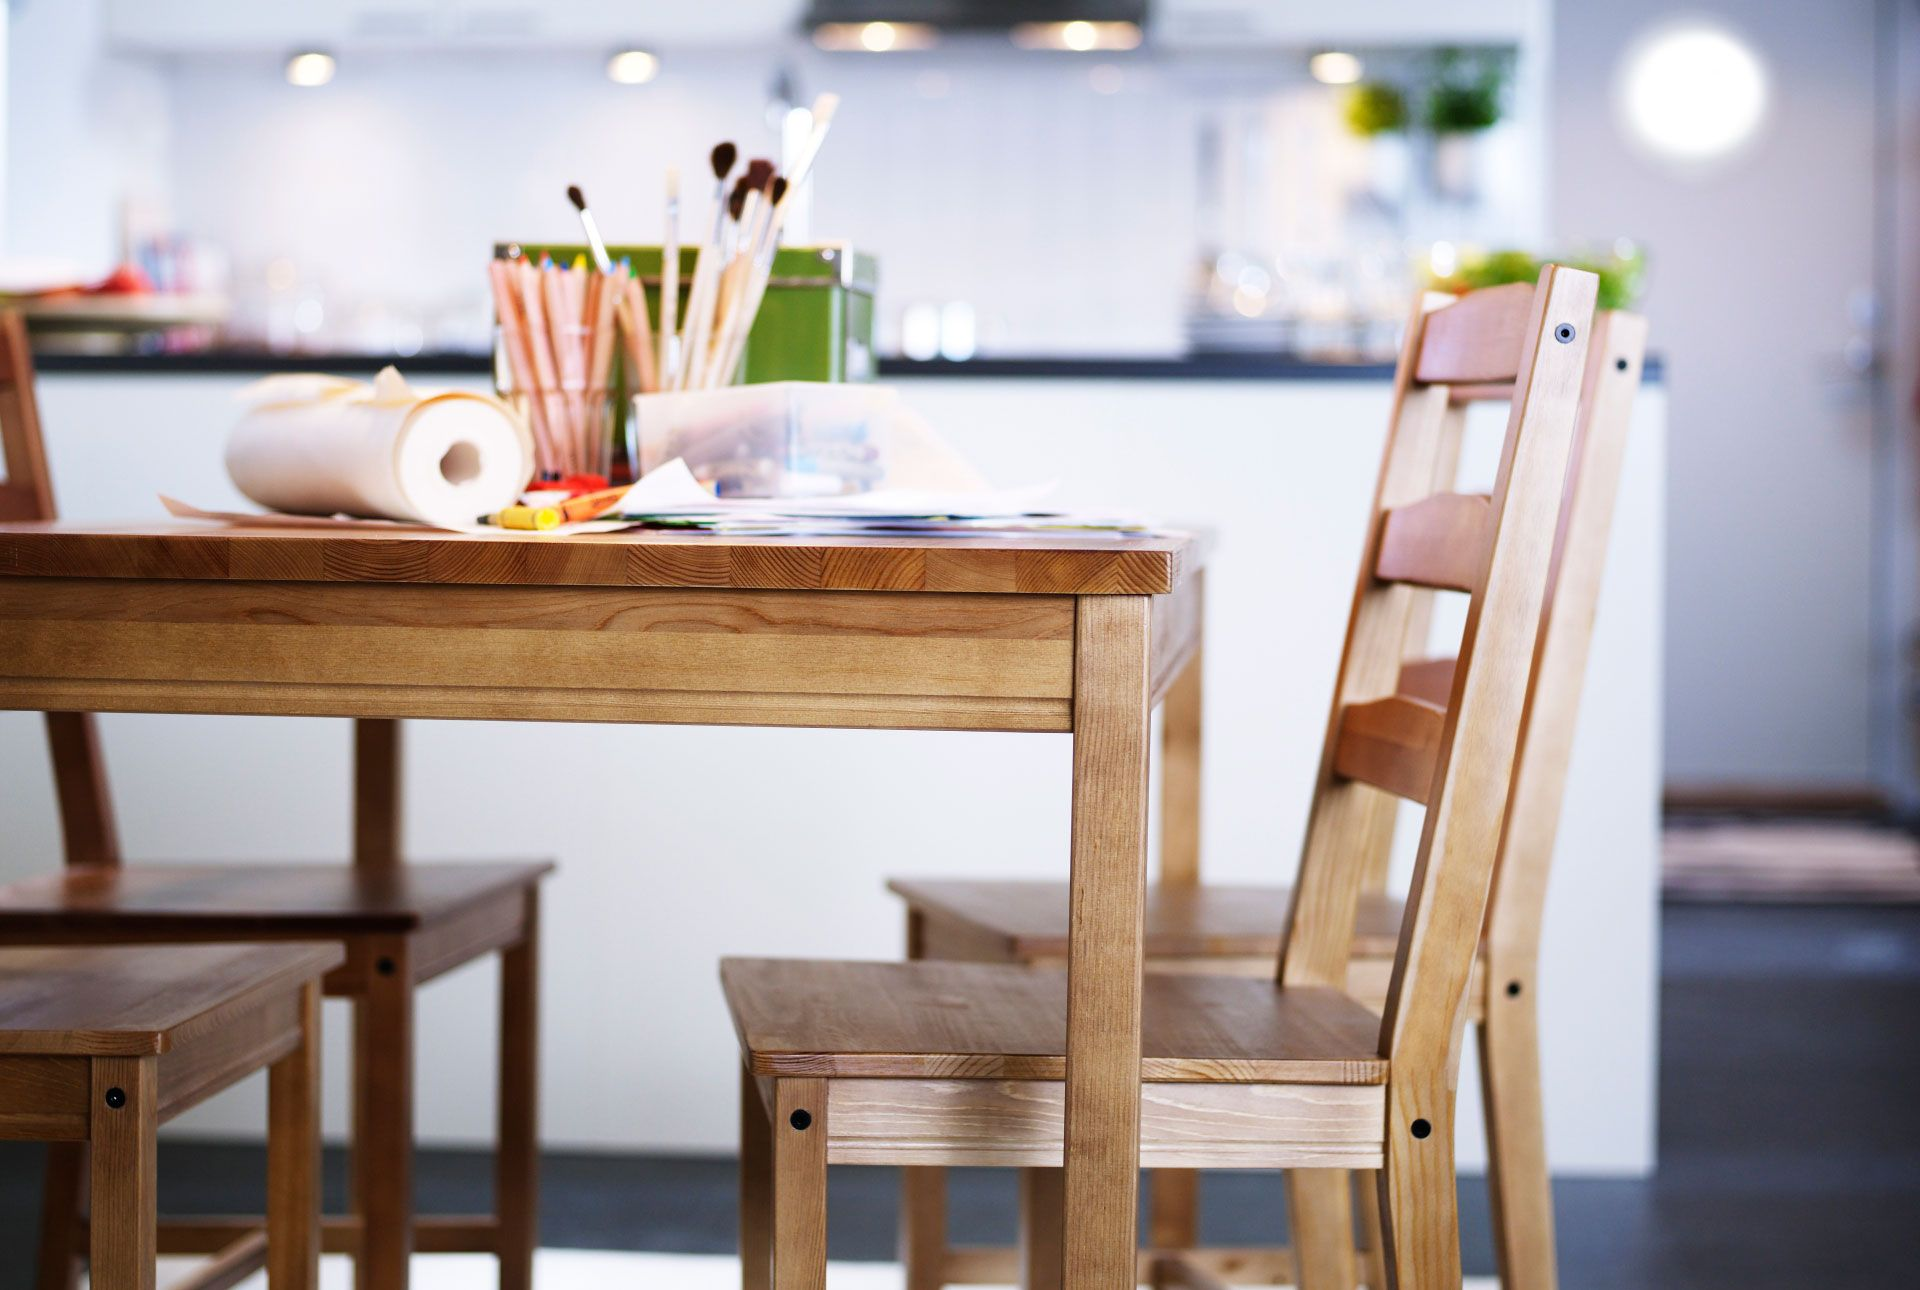 Pin by silents on haha Jokkmokk, Wood dining table, Ikea